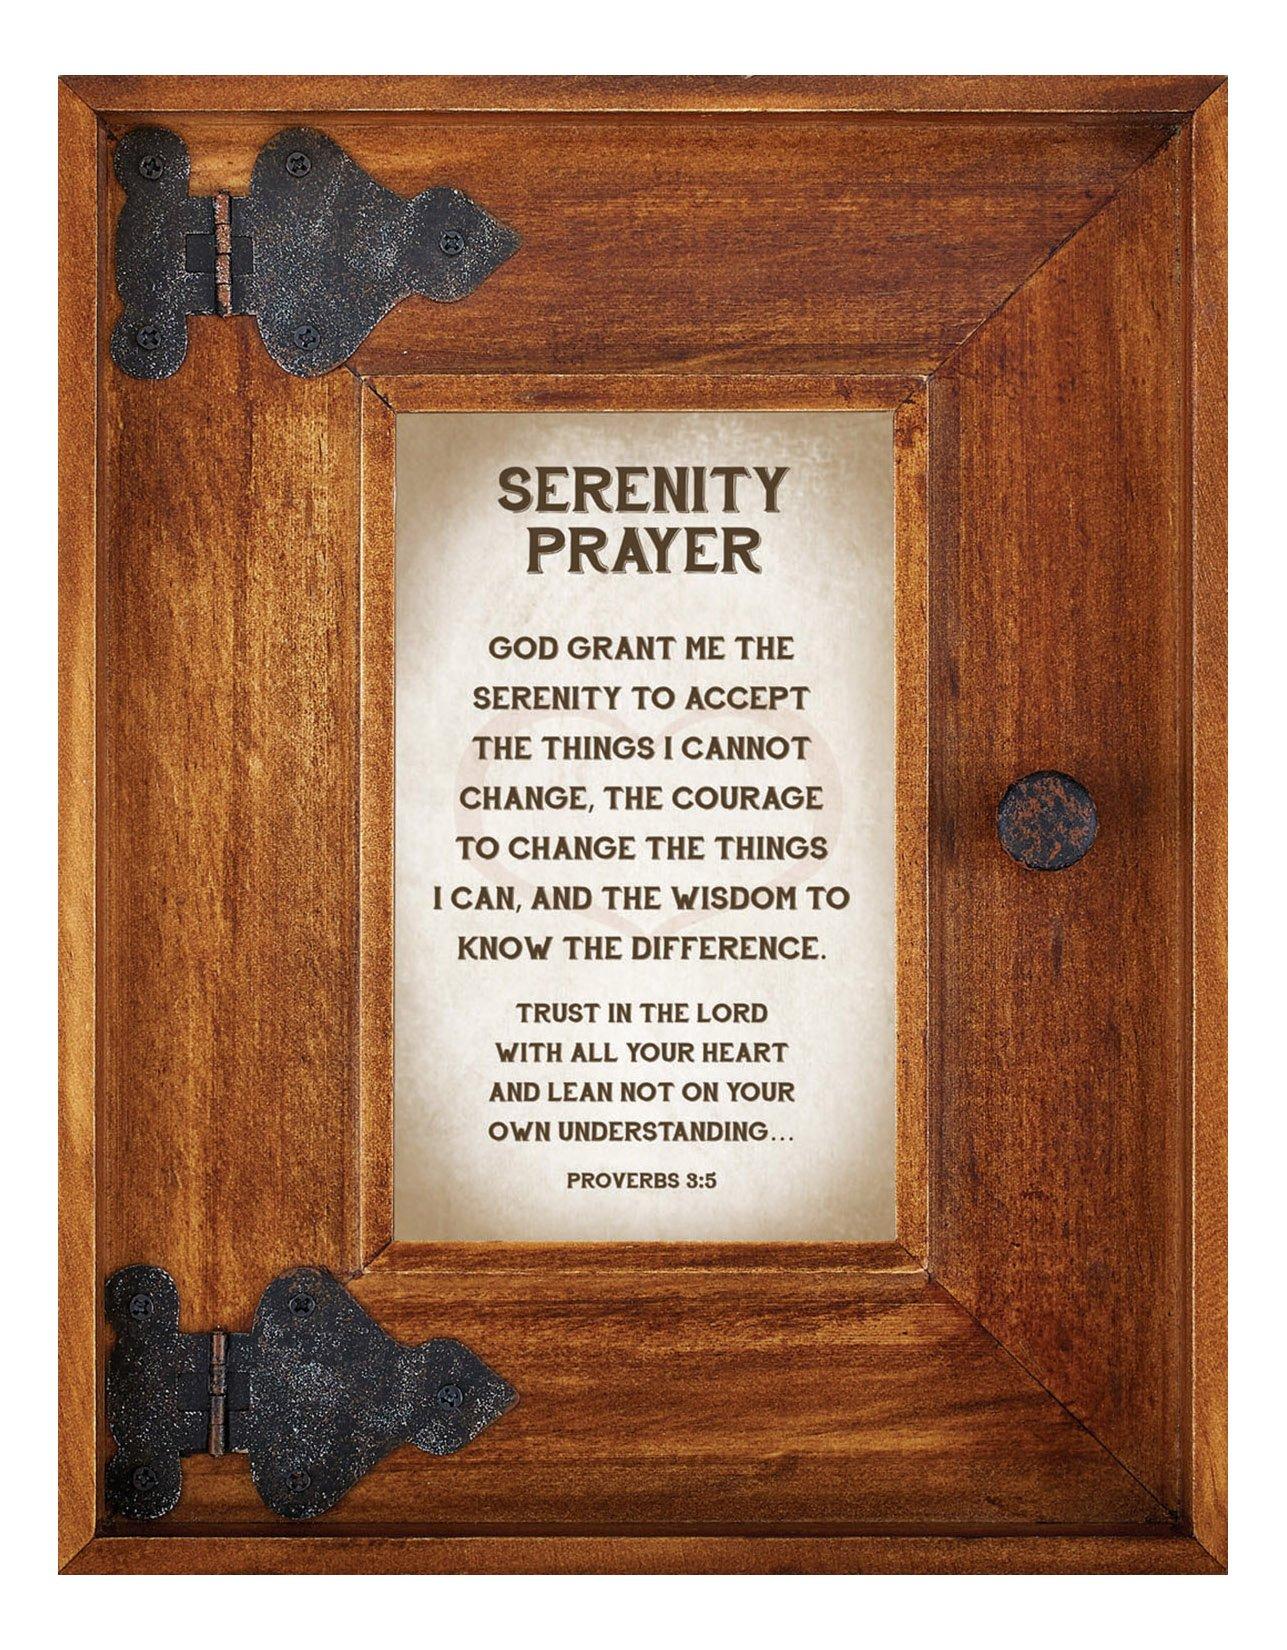 LoveLea Down Home Collection Tabletop Frame, Serenity Prayer